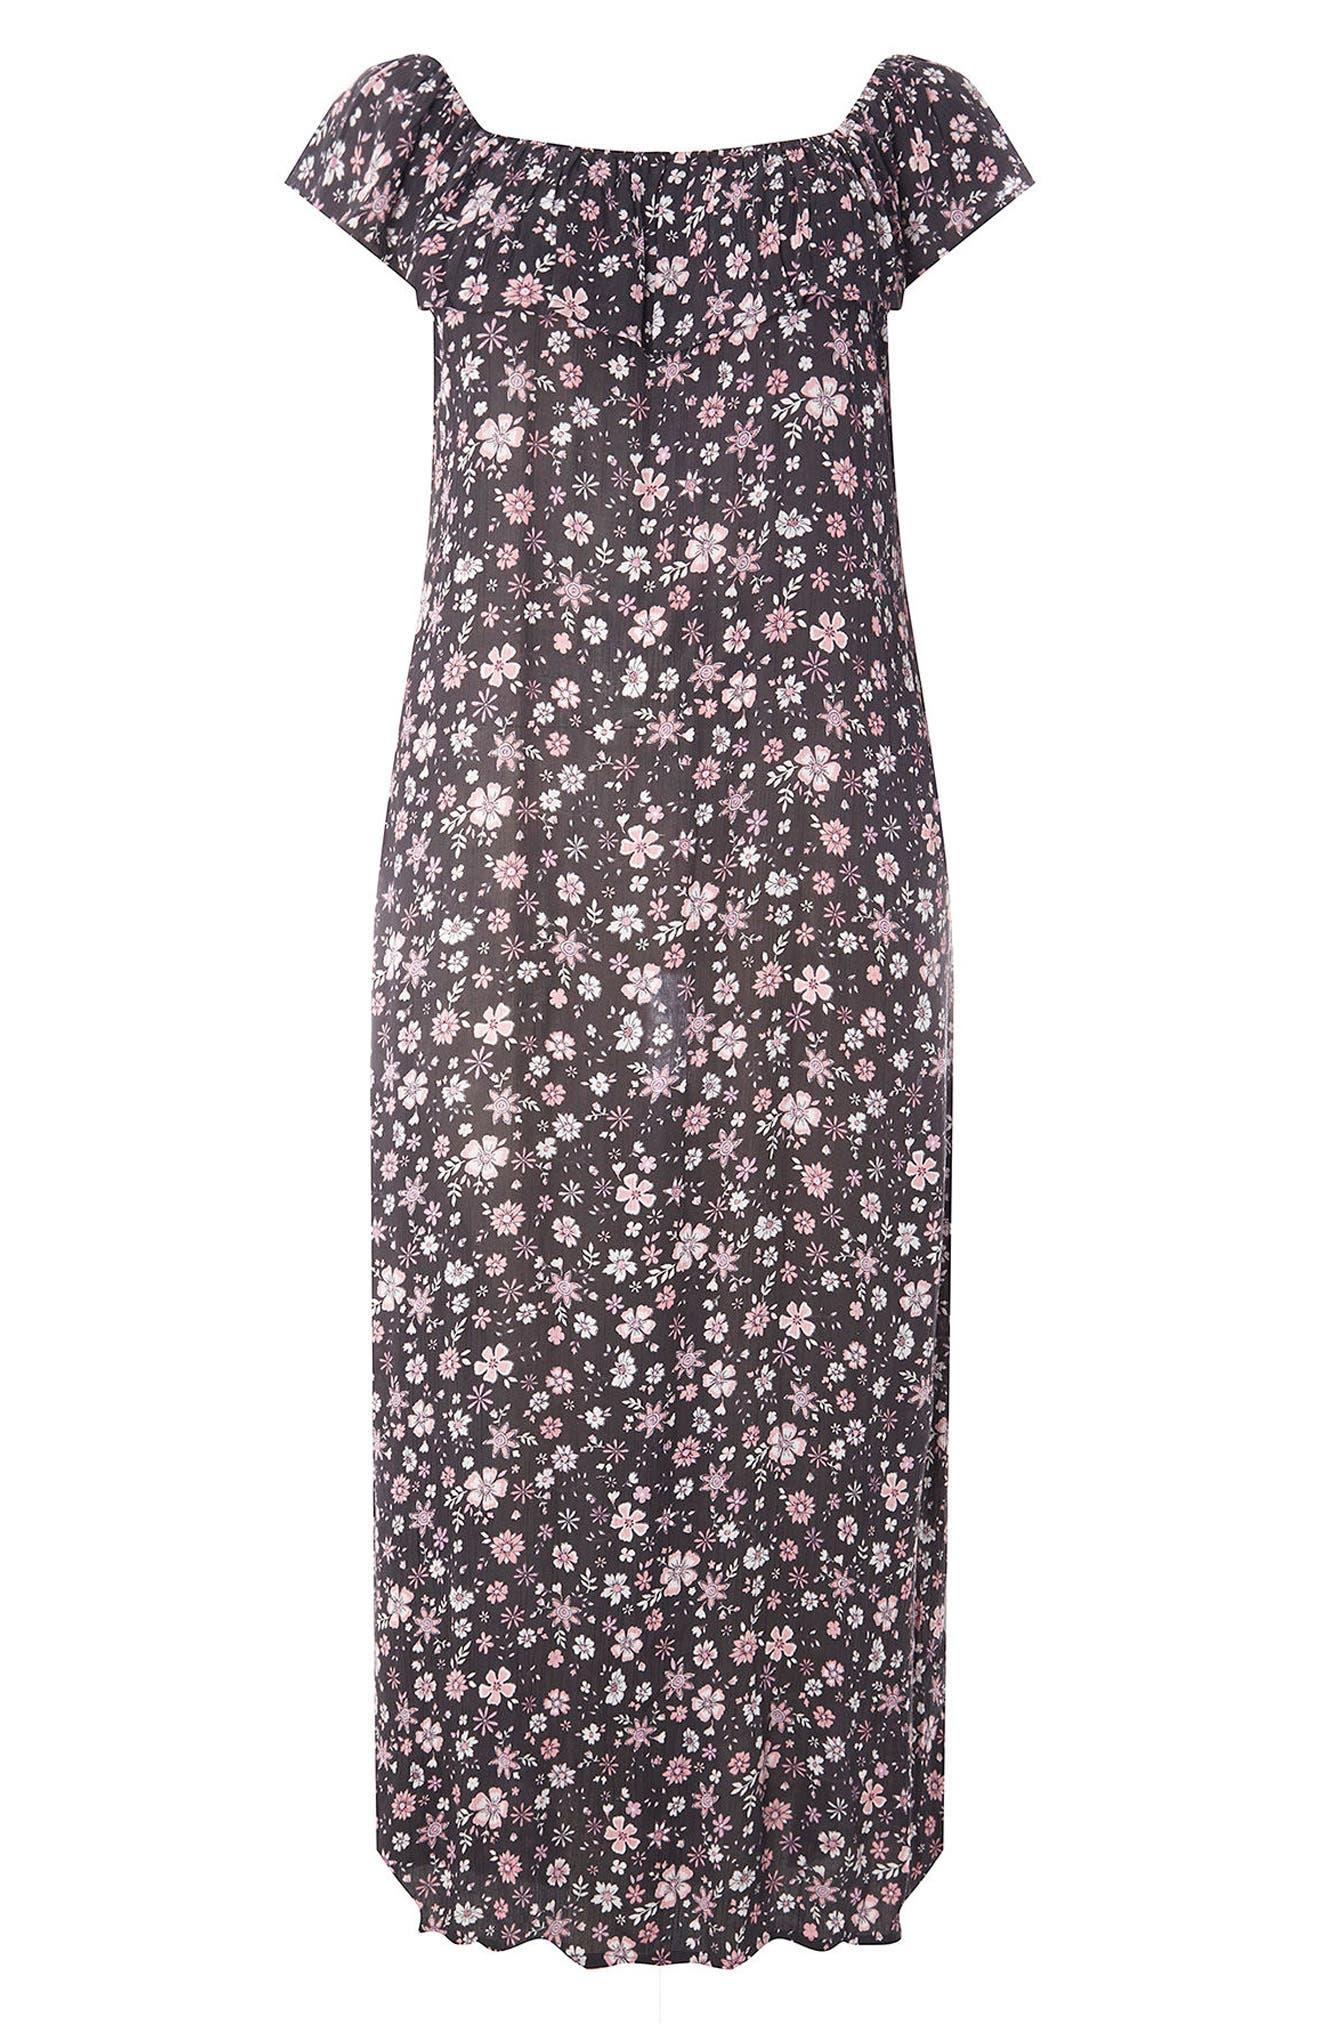 EVANS Ditsy Floral Convertible Maxi Dress